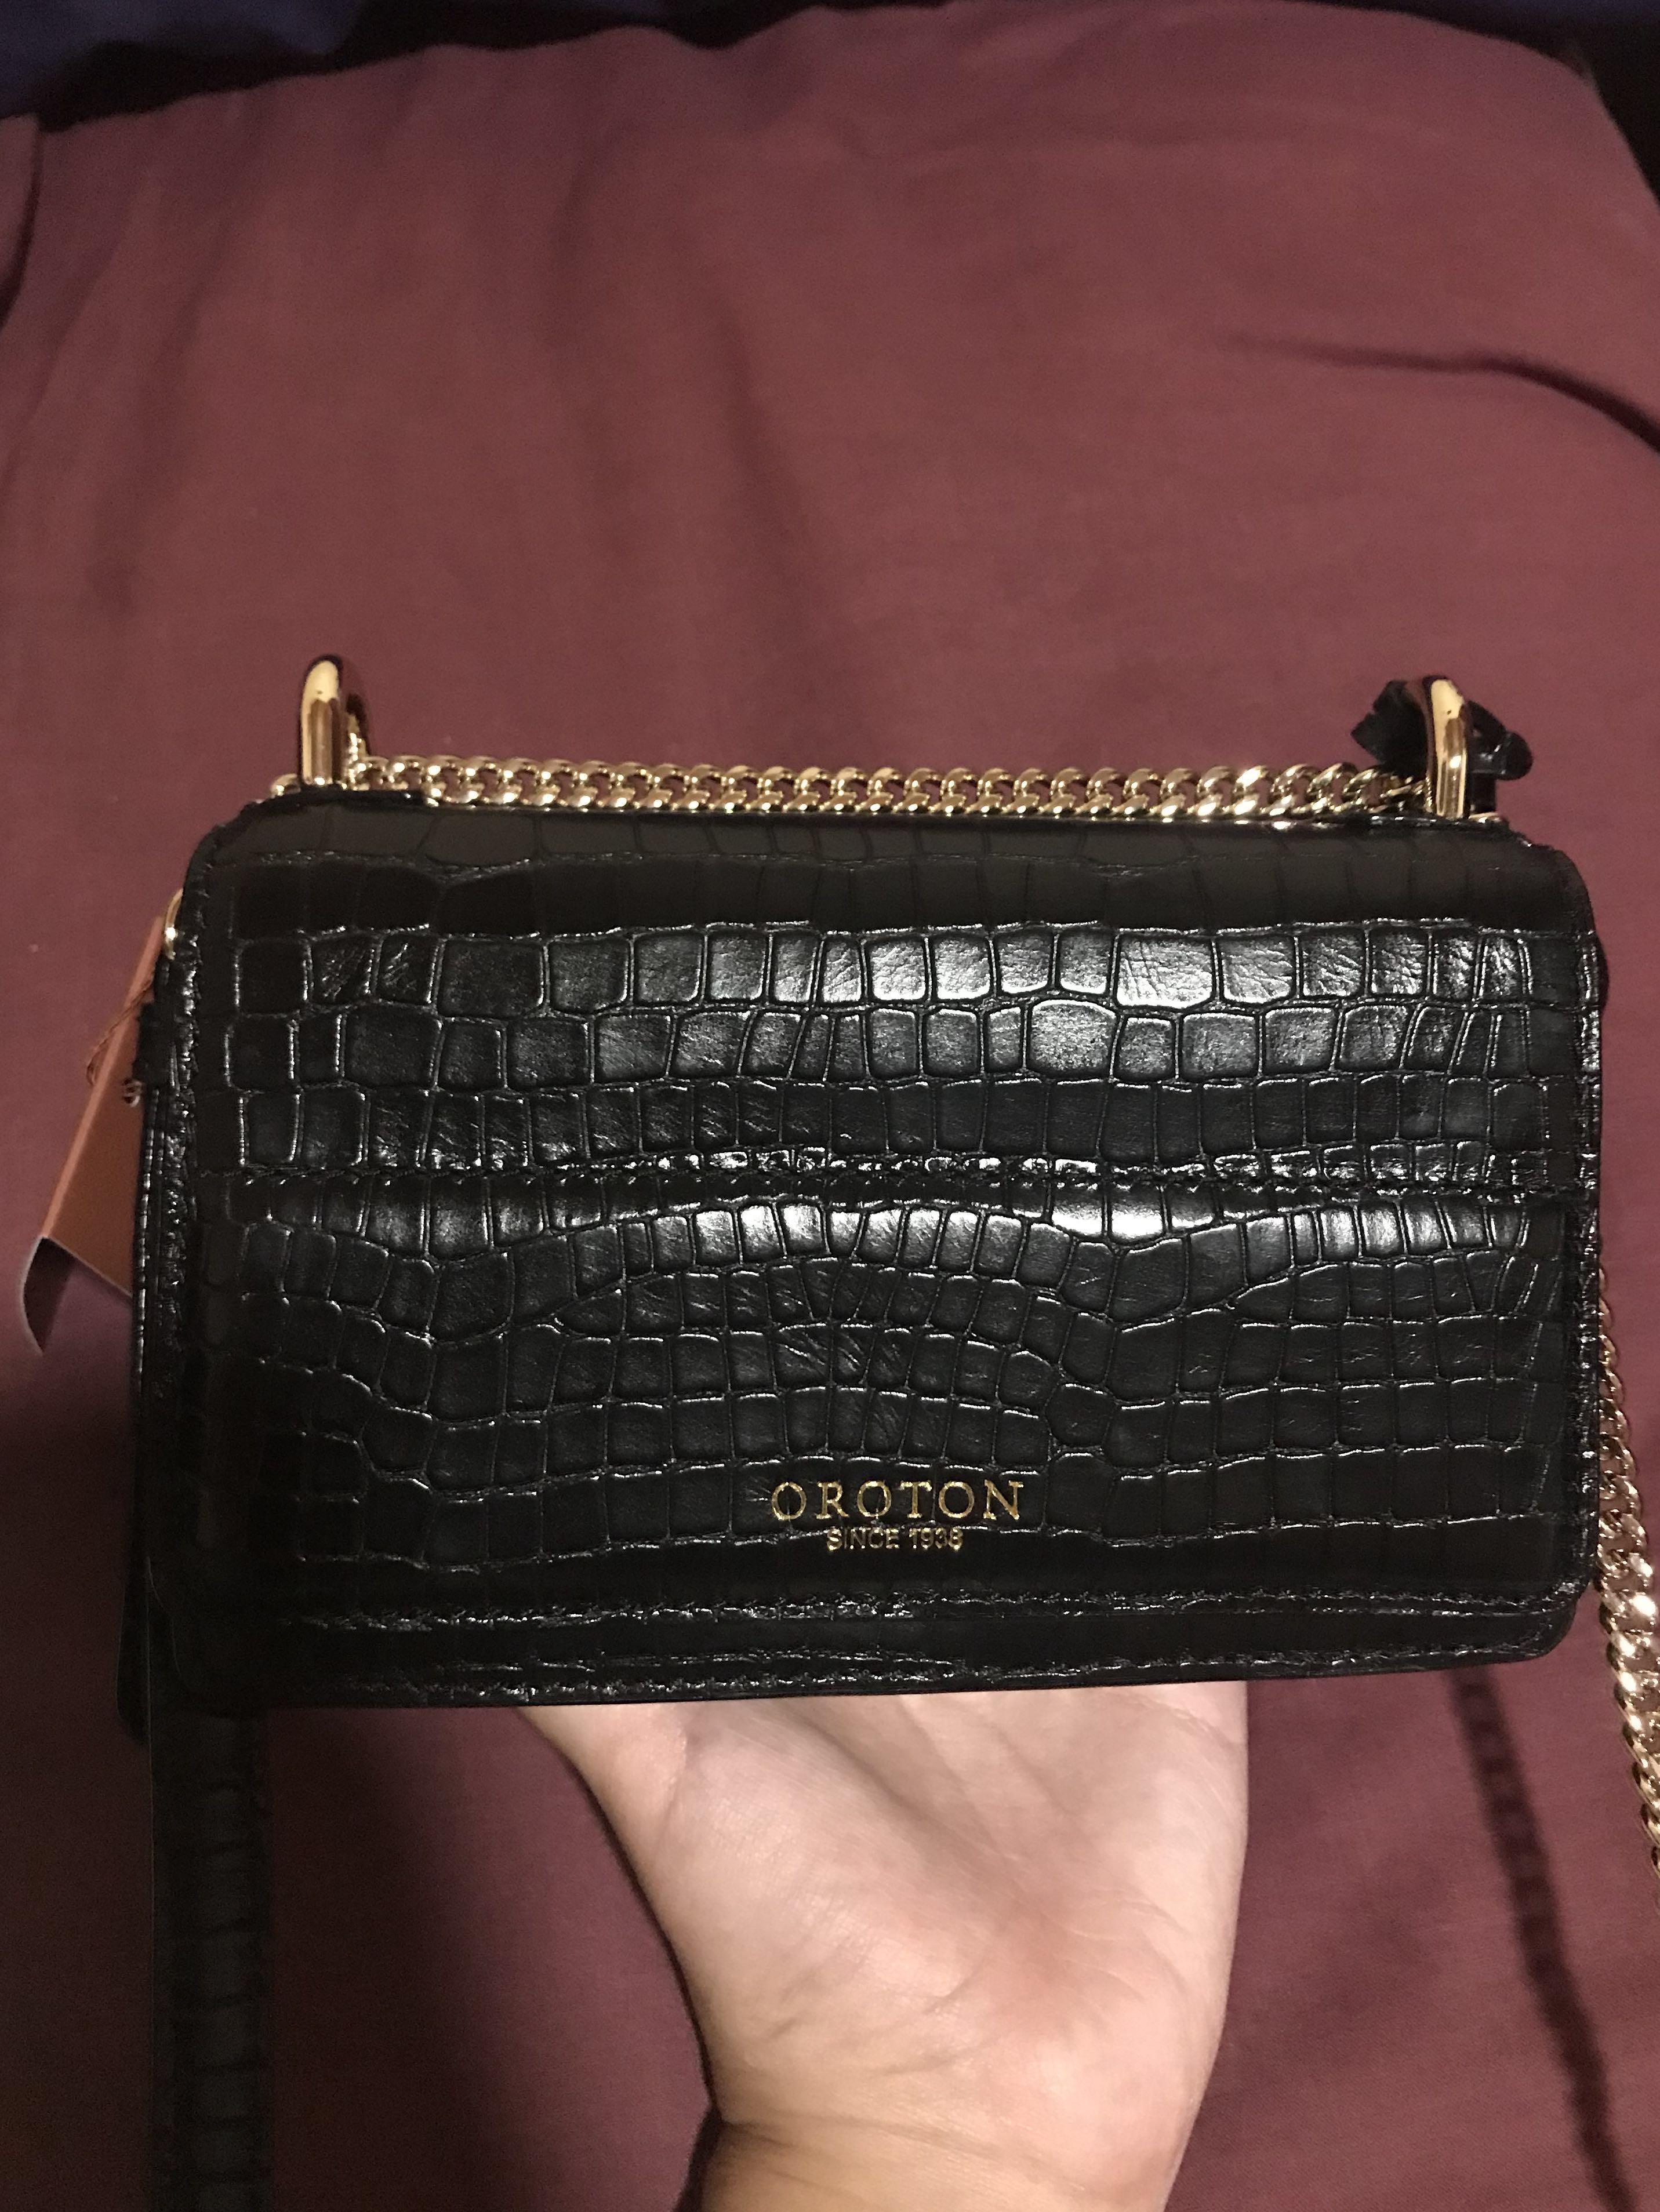 Oroton black croc leather crossbody bag